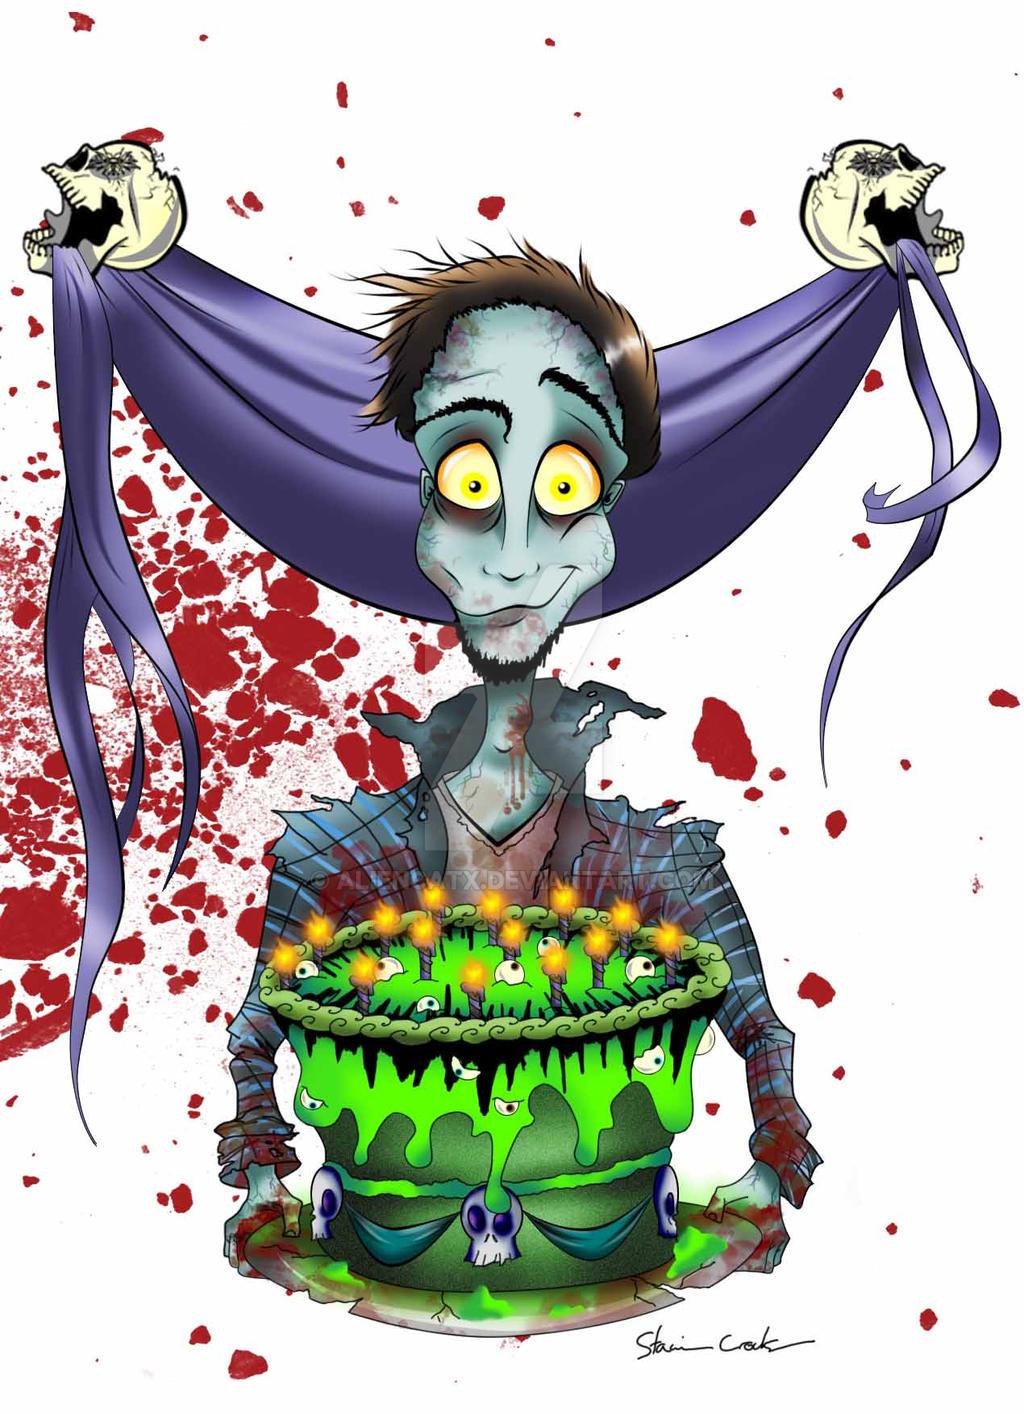 https://img00.deviantart.net/db18/i/2015/111/6/2/joey_the_zombie_birthday_card_by_aliencatx-d64twyz.jpg